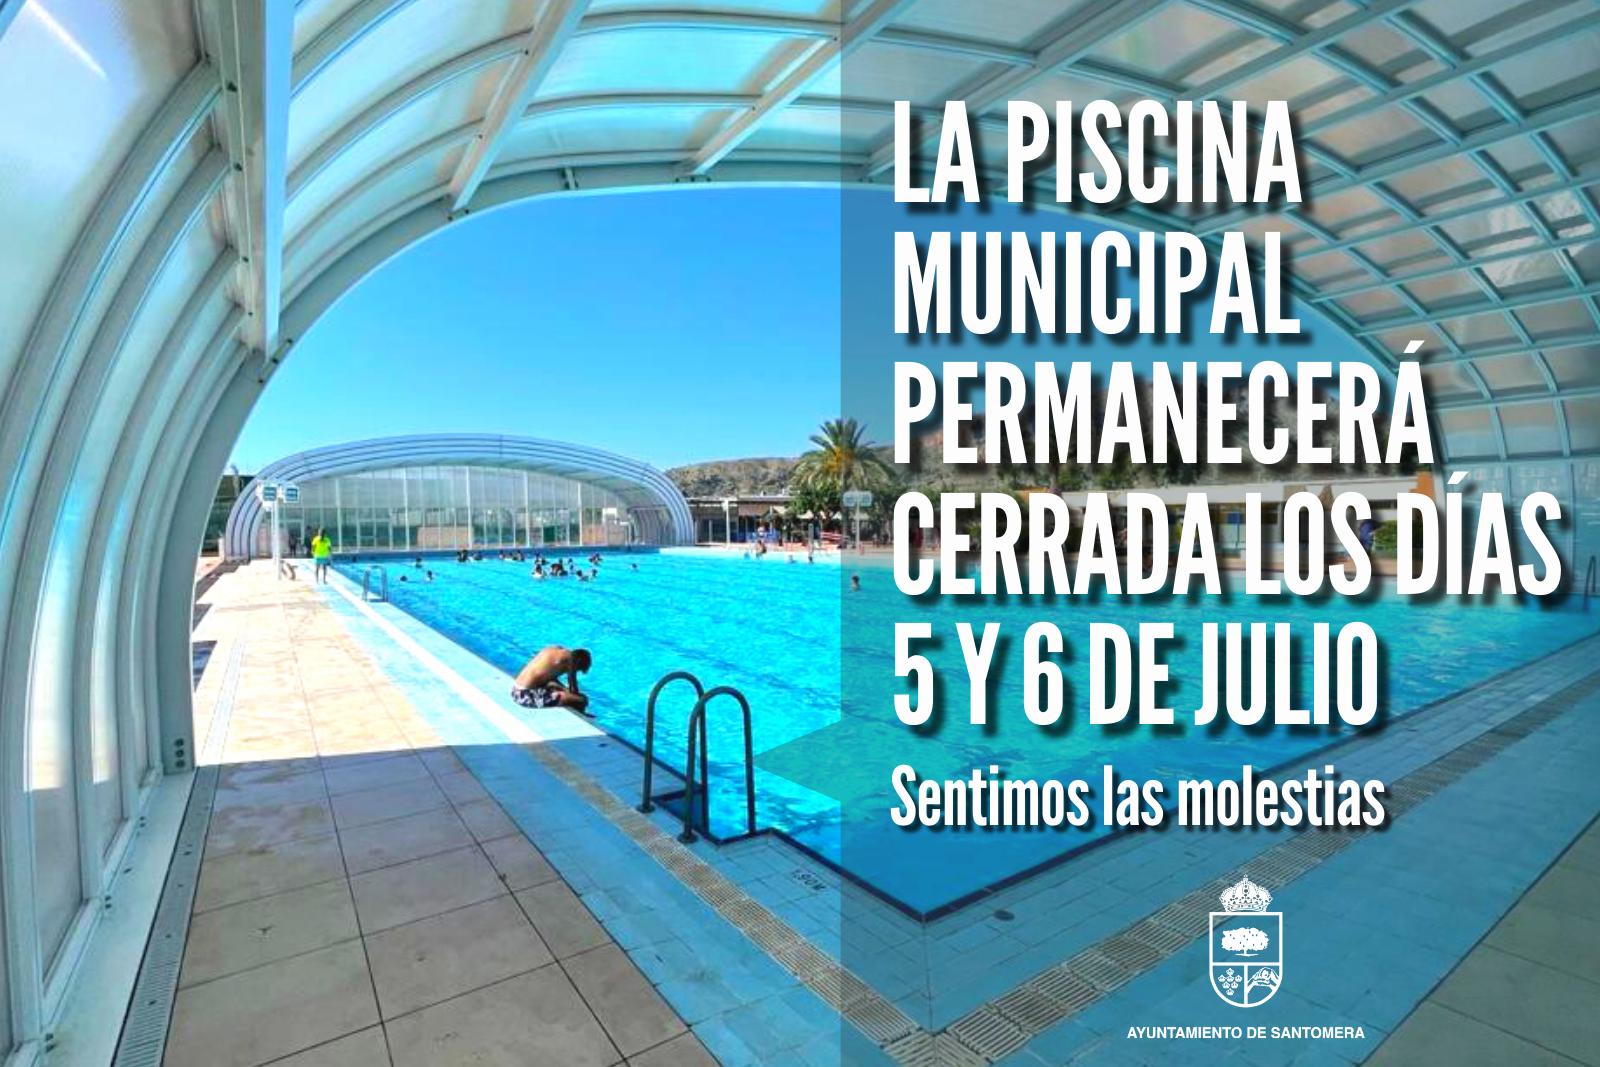 20210705_Cierre piscina municipal